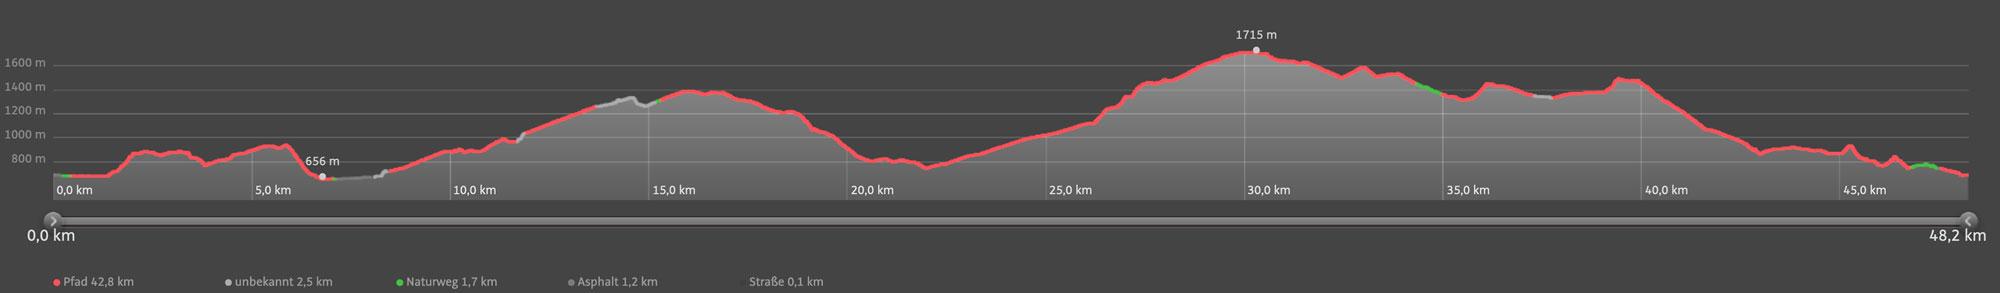 Höhenprofil Bizautrail Ultra